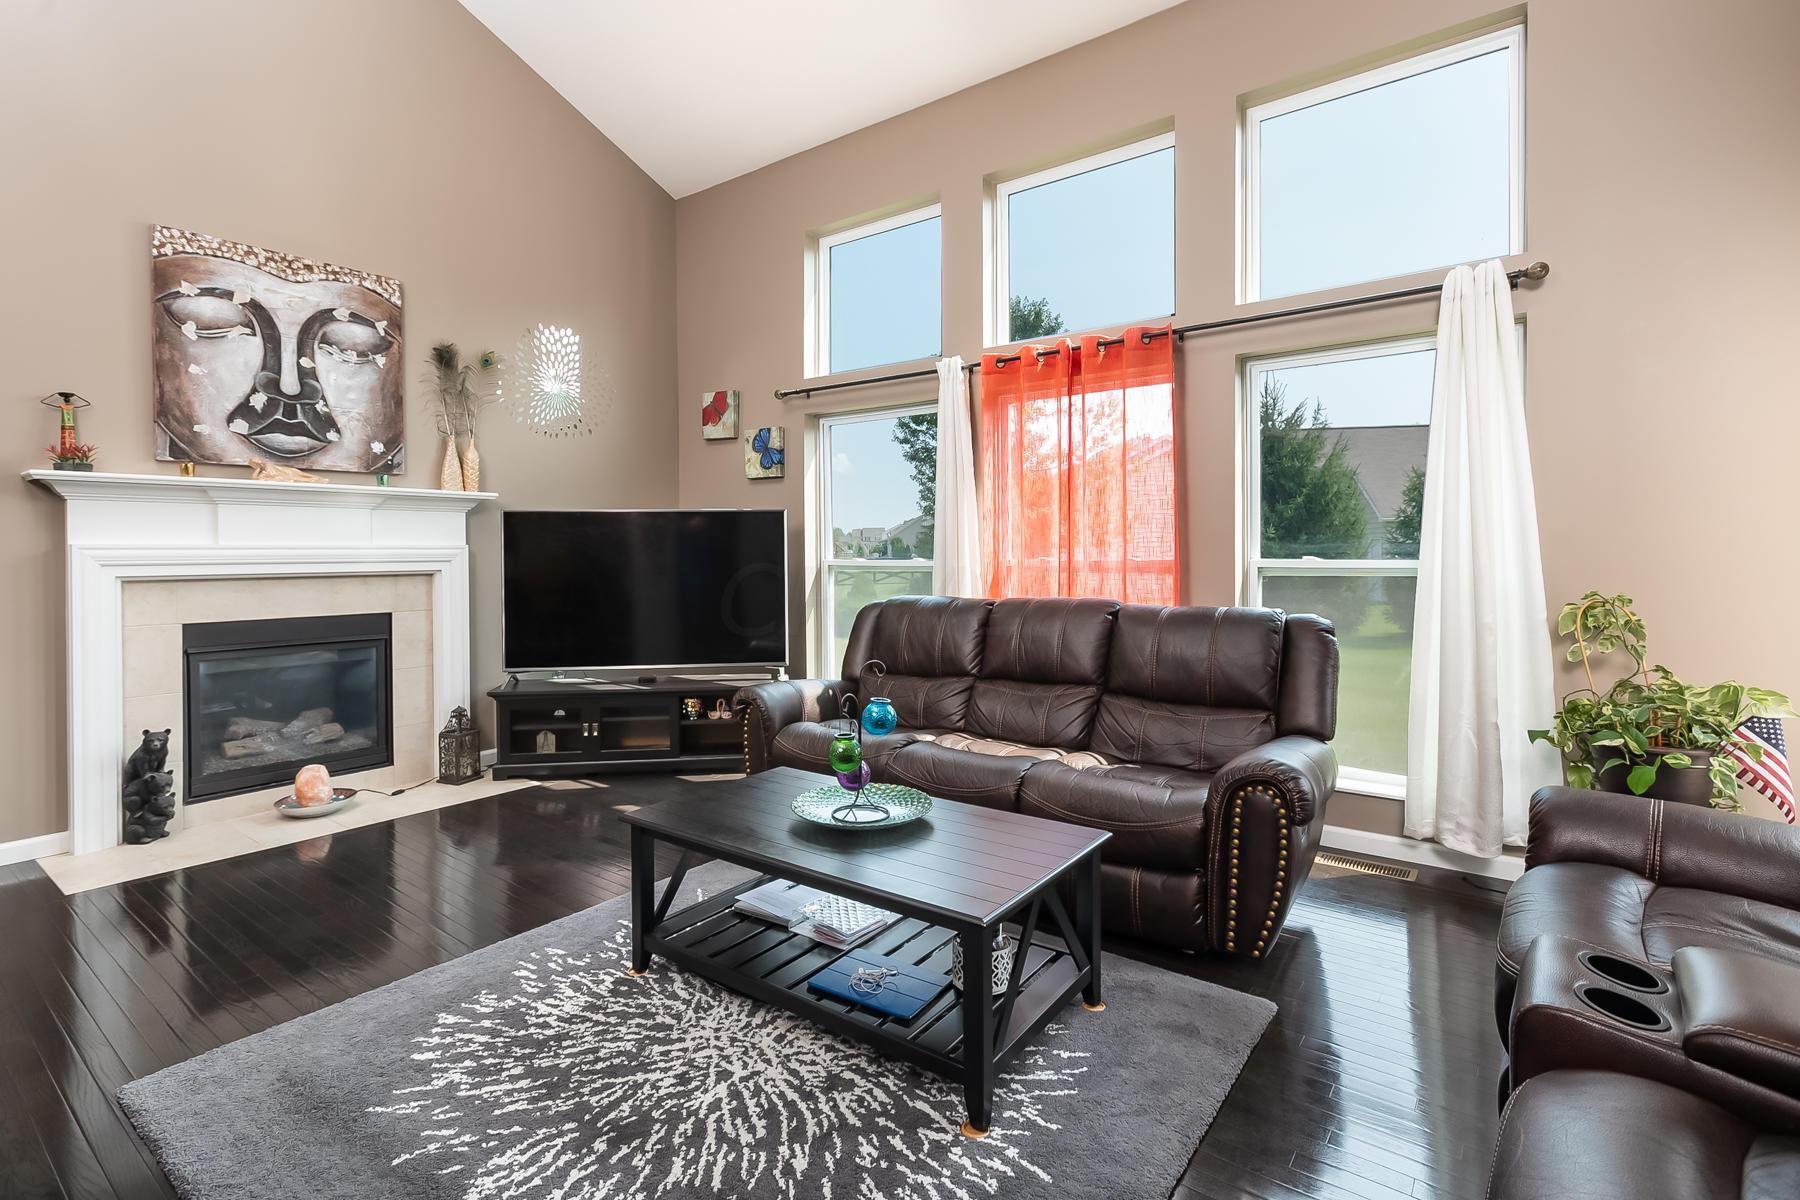 811 Maple Vista Drive, Delaware, Ohio 43015, 4 Bedrooms Bedrooms, ,3 BathroomsBathrooms,Residential,For Sale,Maple Vista,220031565